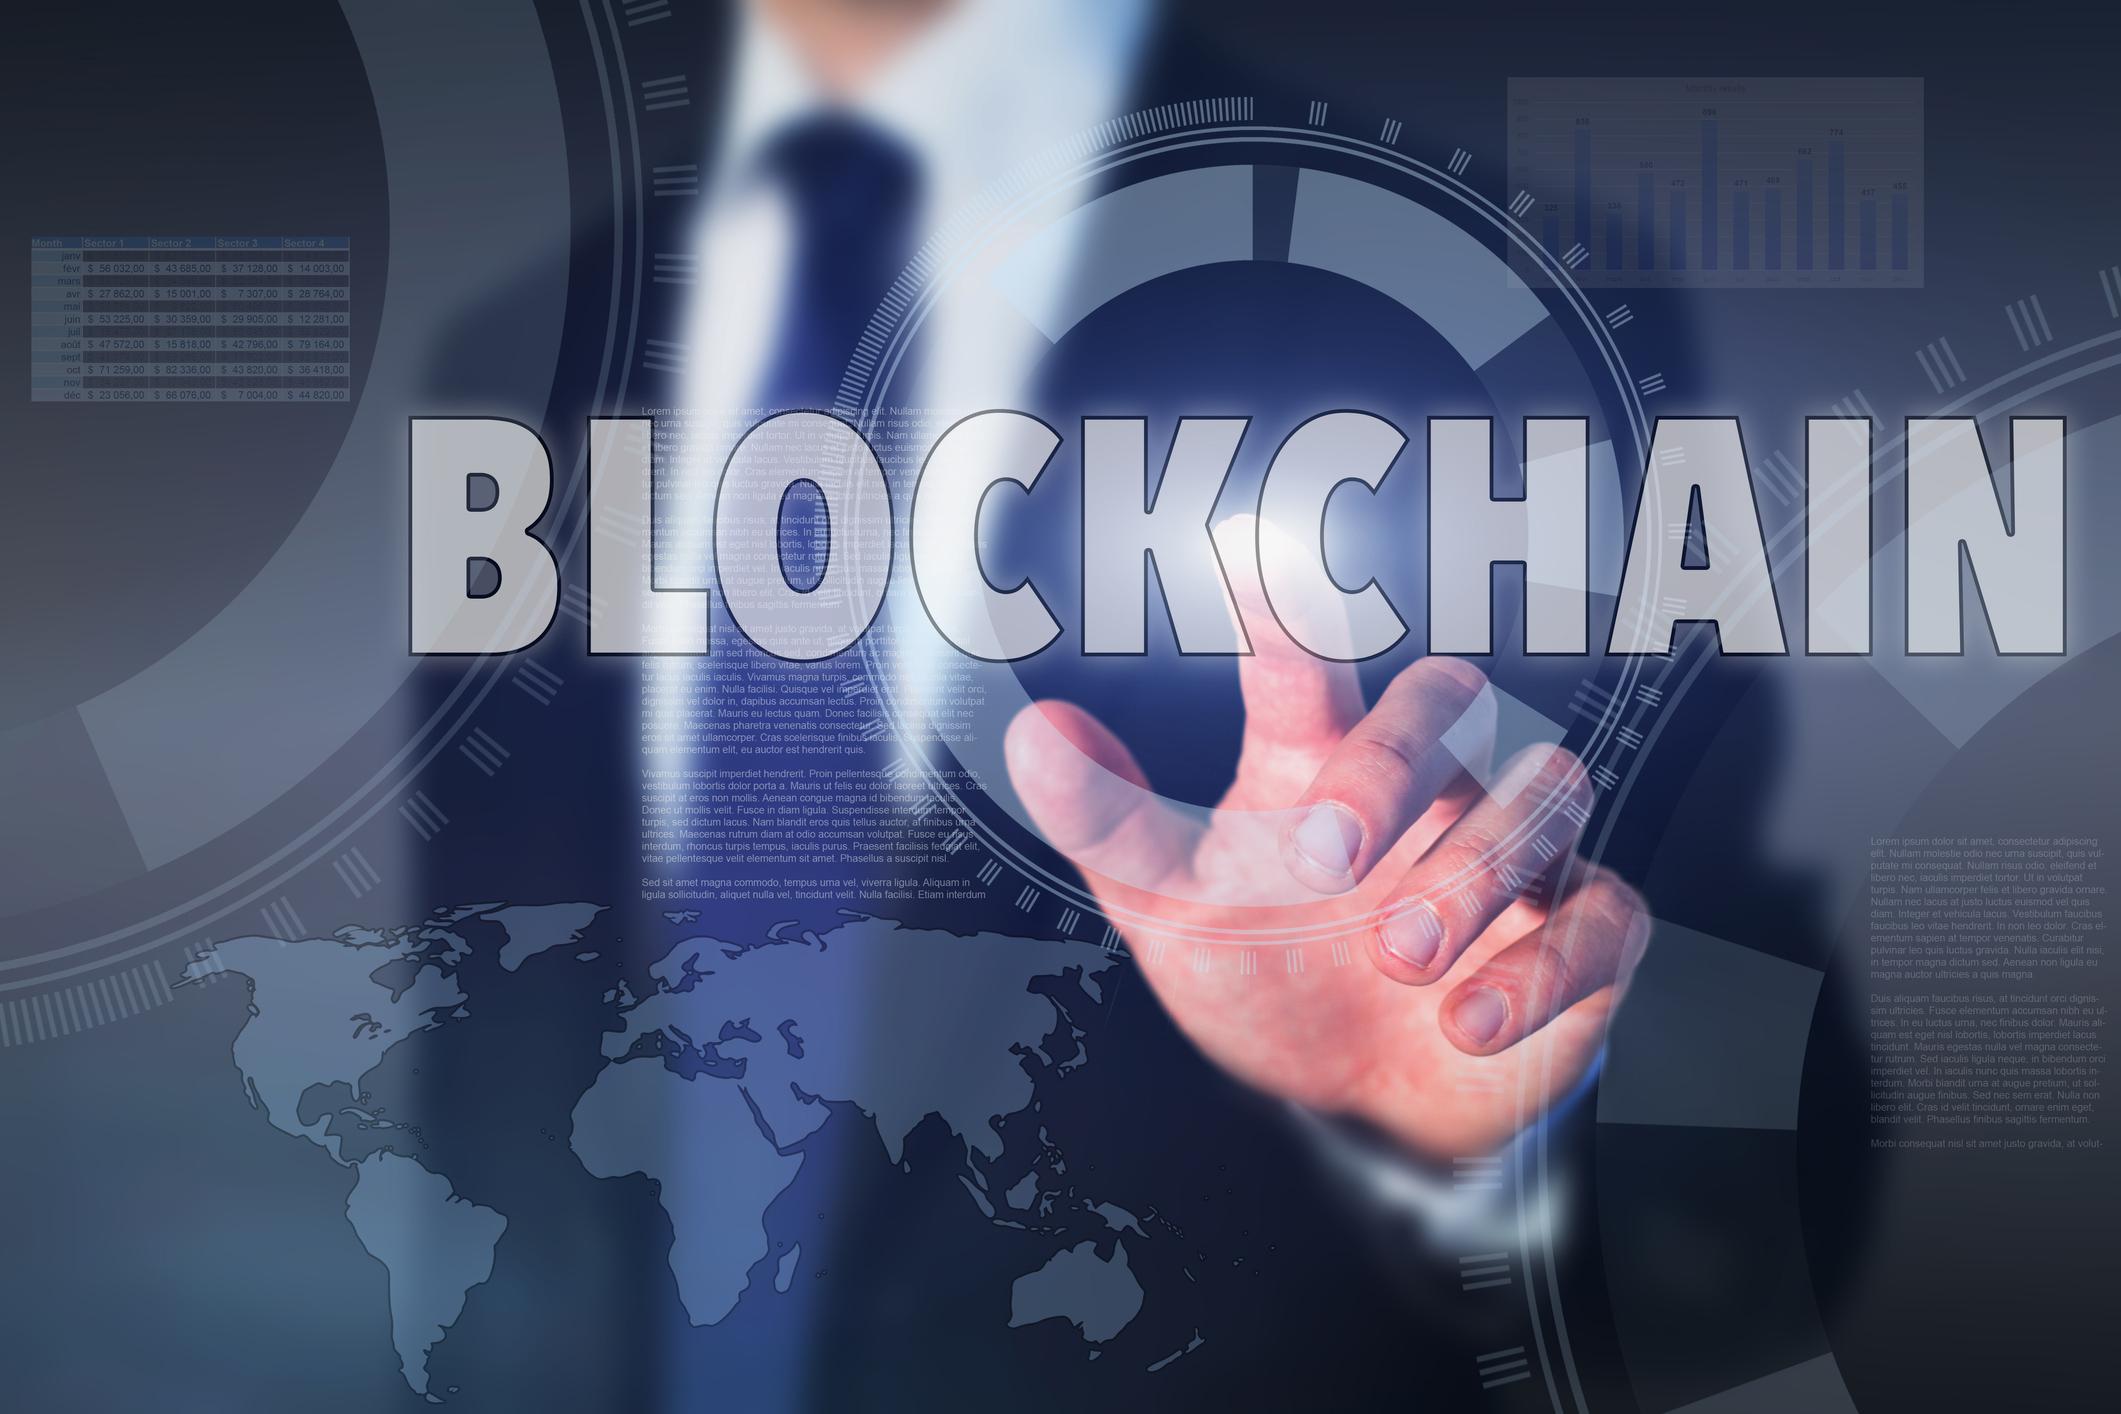 https://www.zlato.cz/wp-content/uploads/blockchain_iStock-615399260.jpg